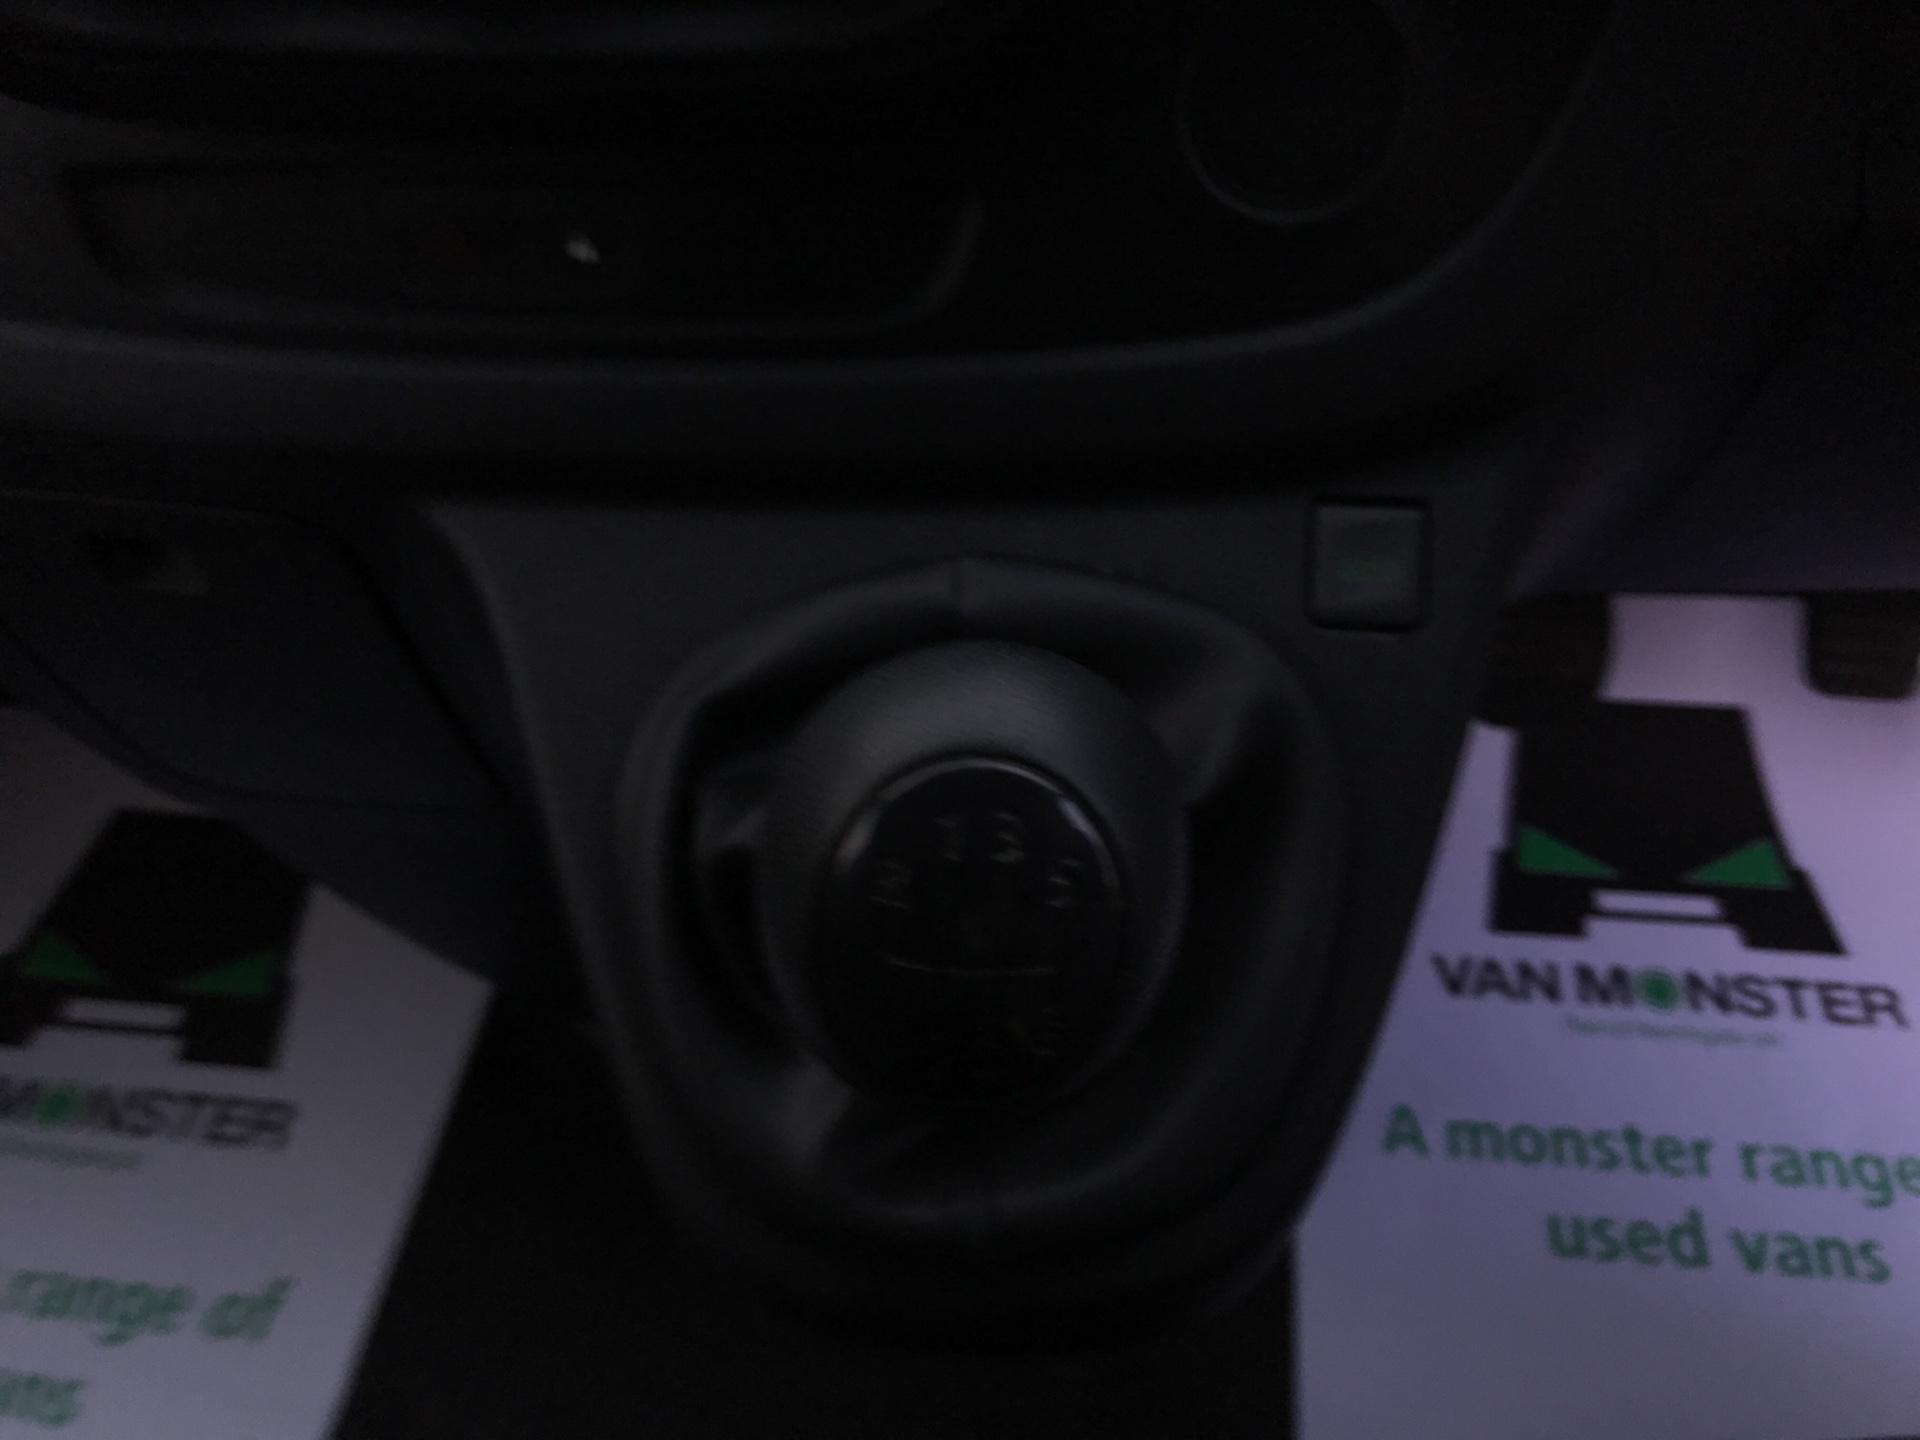 2017 Vauxhall Vivaro L2 H1 2900 1.6CDTI 95PS EURO 6 *VALUE RANGE VEHICLE CONDITION REFLECTED IN PRICE* (BK17OND) Image 11